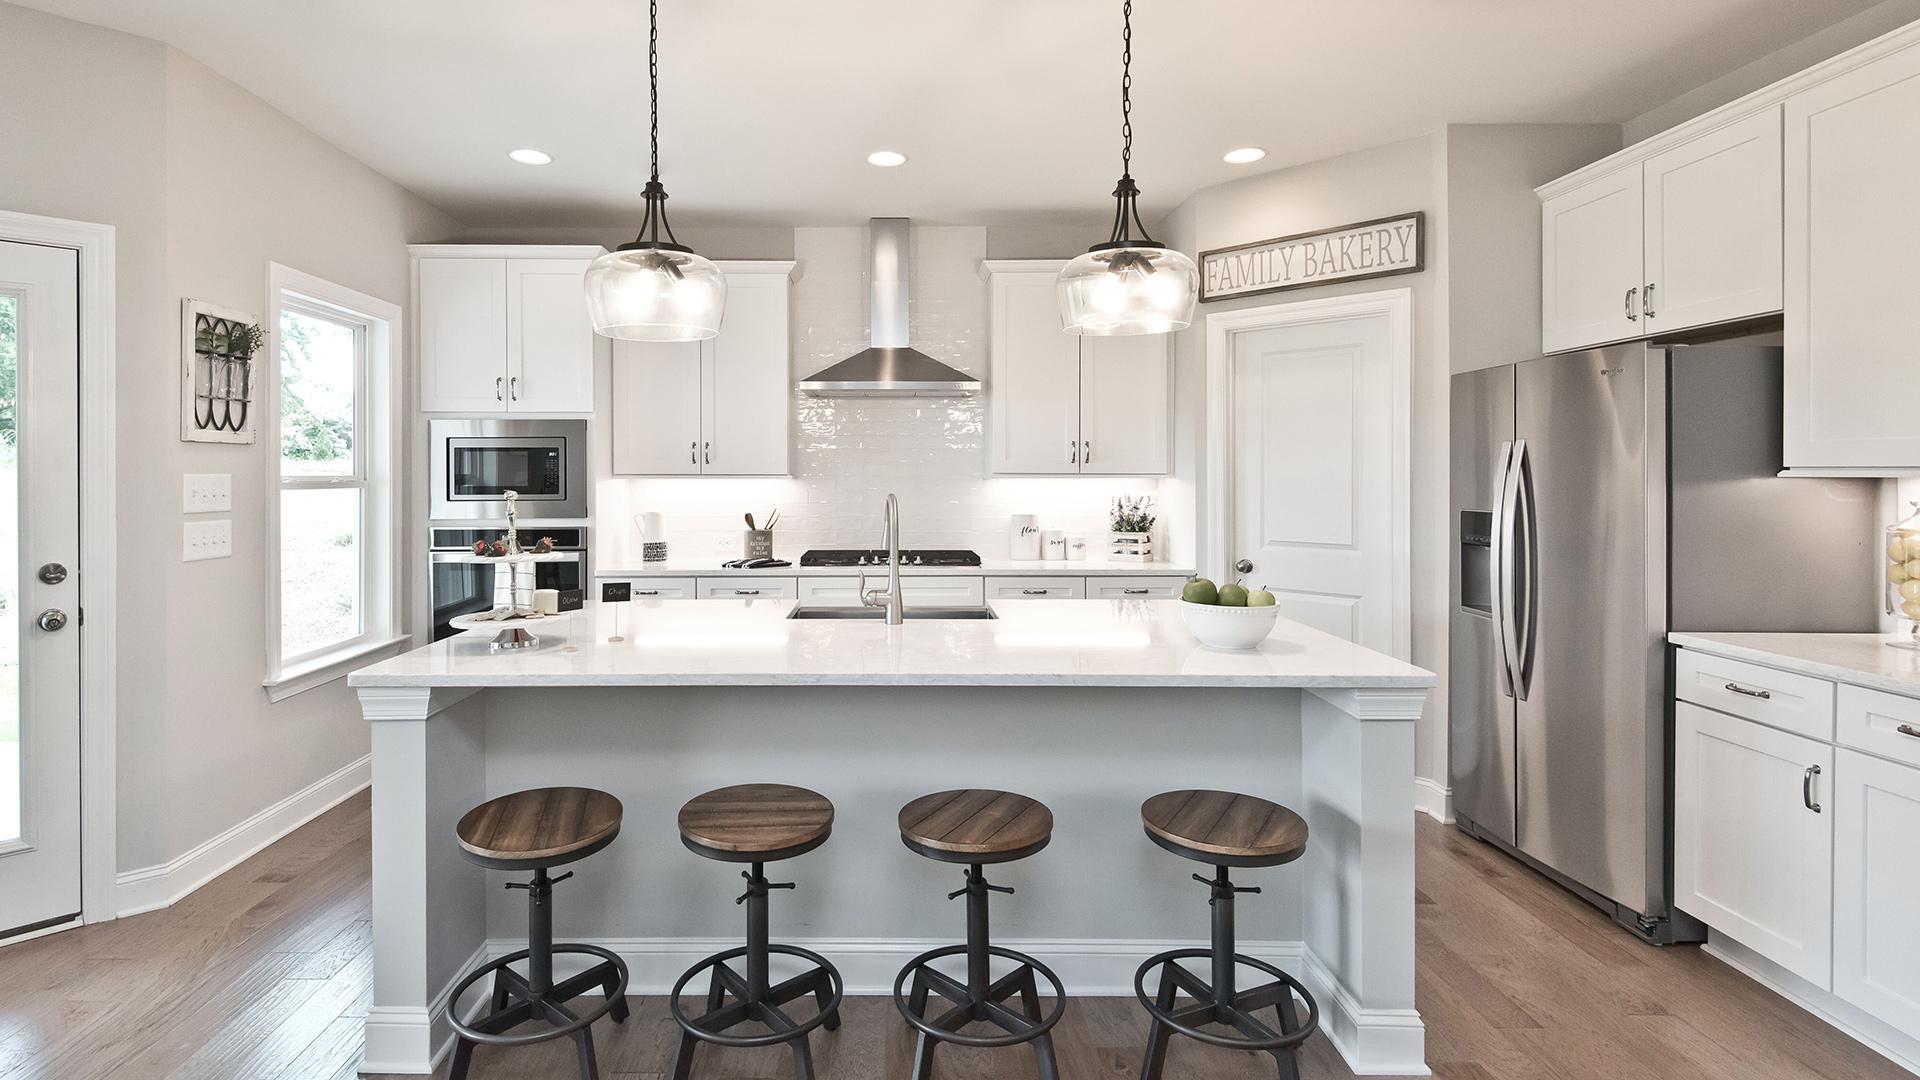 Enjoy the expansive open gourmet kitchen